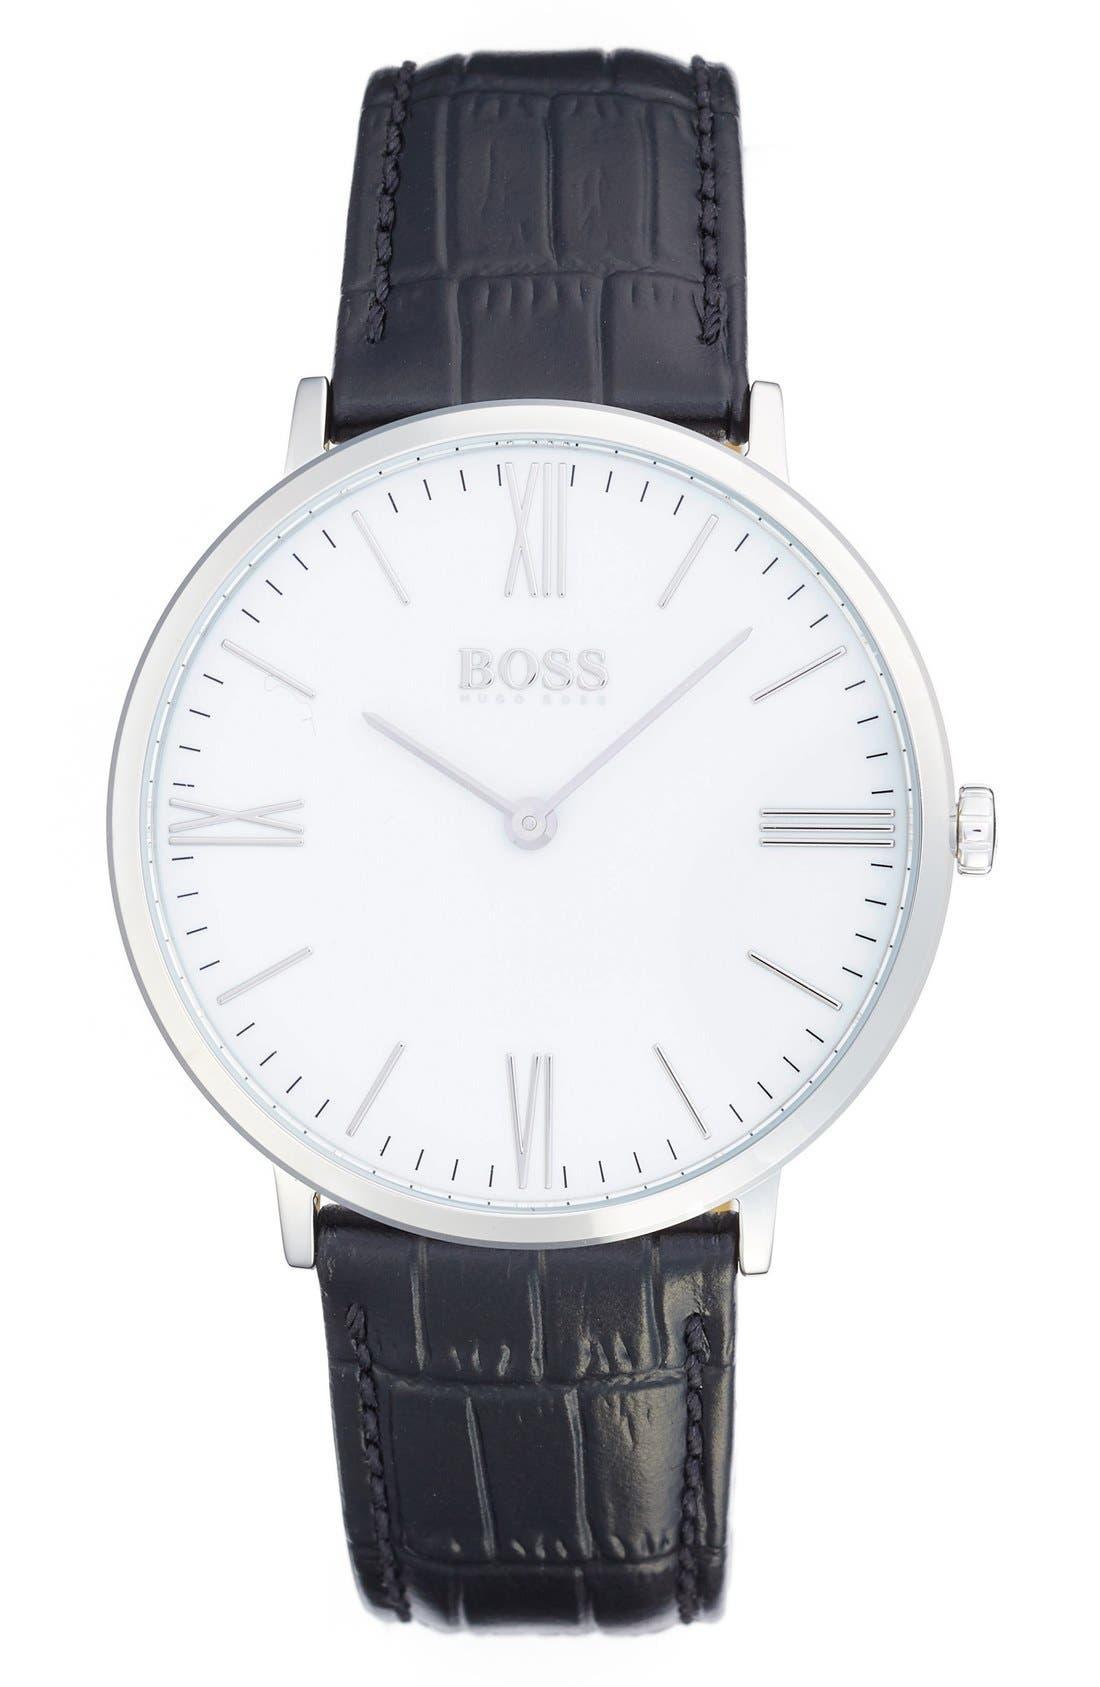 Main Image - BOSS Ultra Slim Leather Strap Watch, 40mm